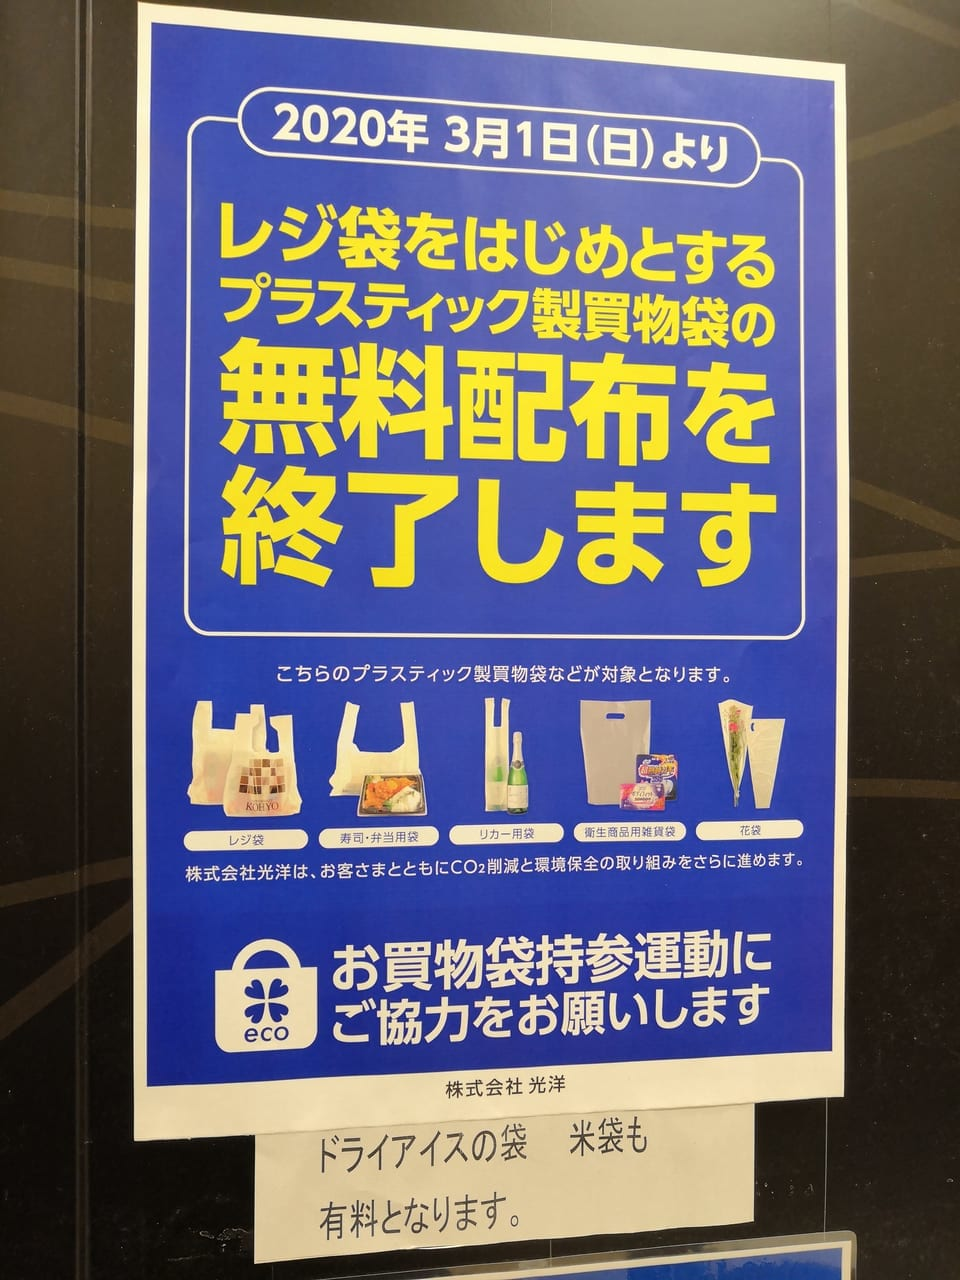 KOHYO レジ袋廃止